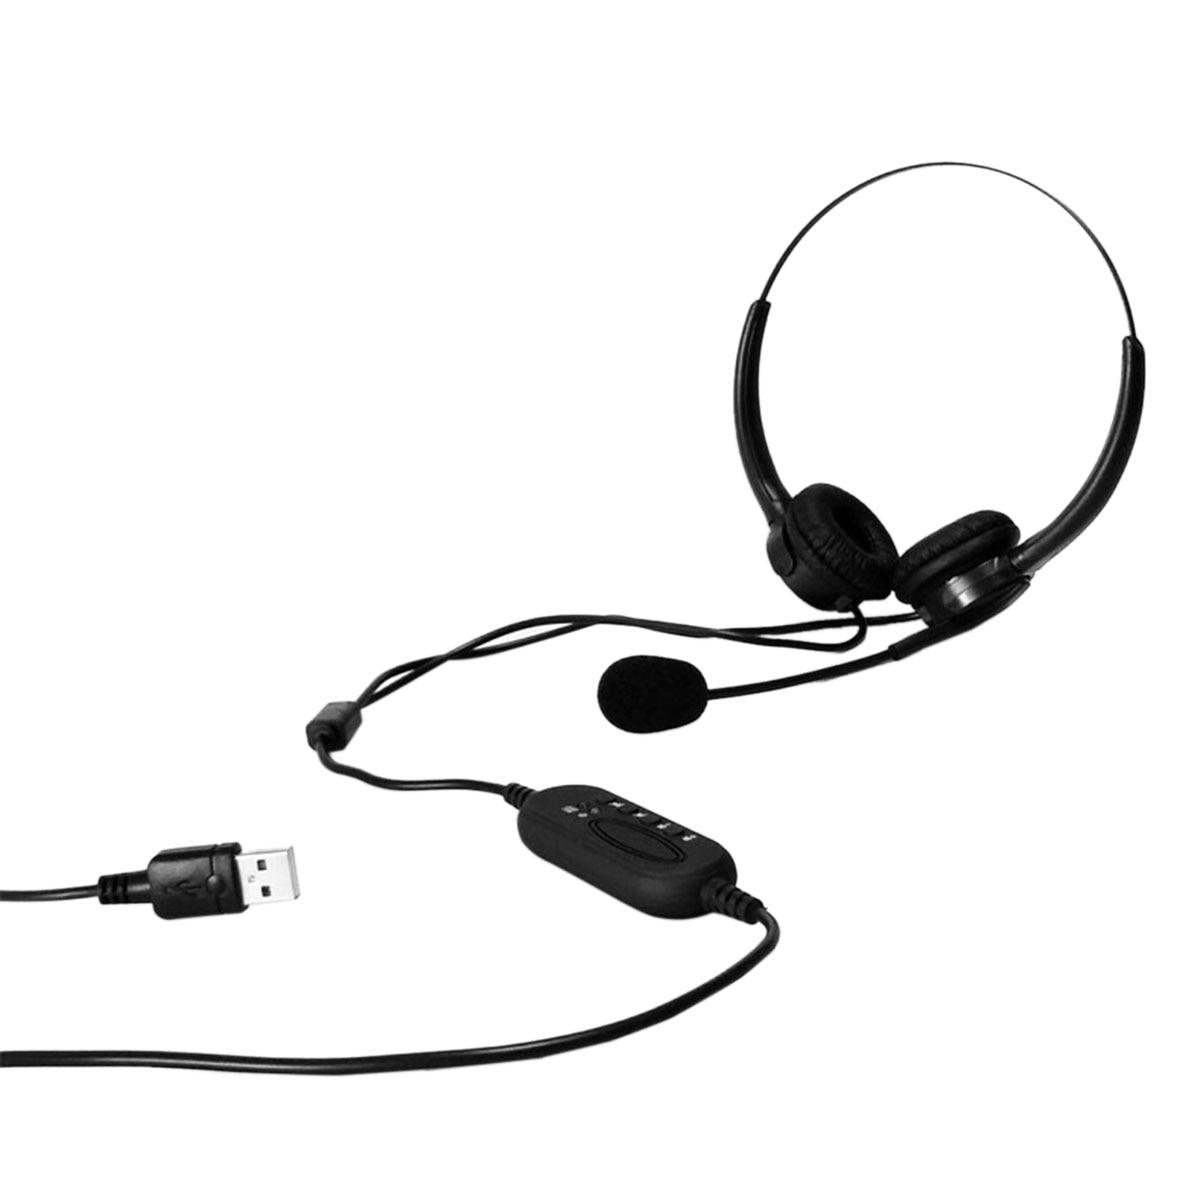 Auriculares de Teléfono manos libres, centro de llamadas, cancelación de ruido, auriculares binaurales con cable con Mini para ordenador portátil